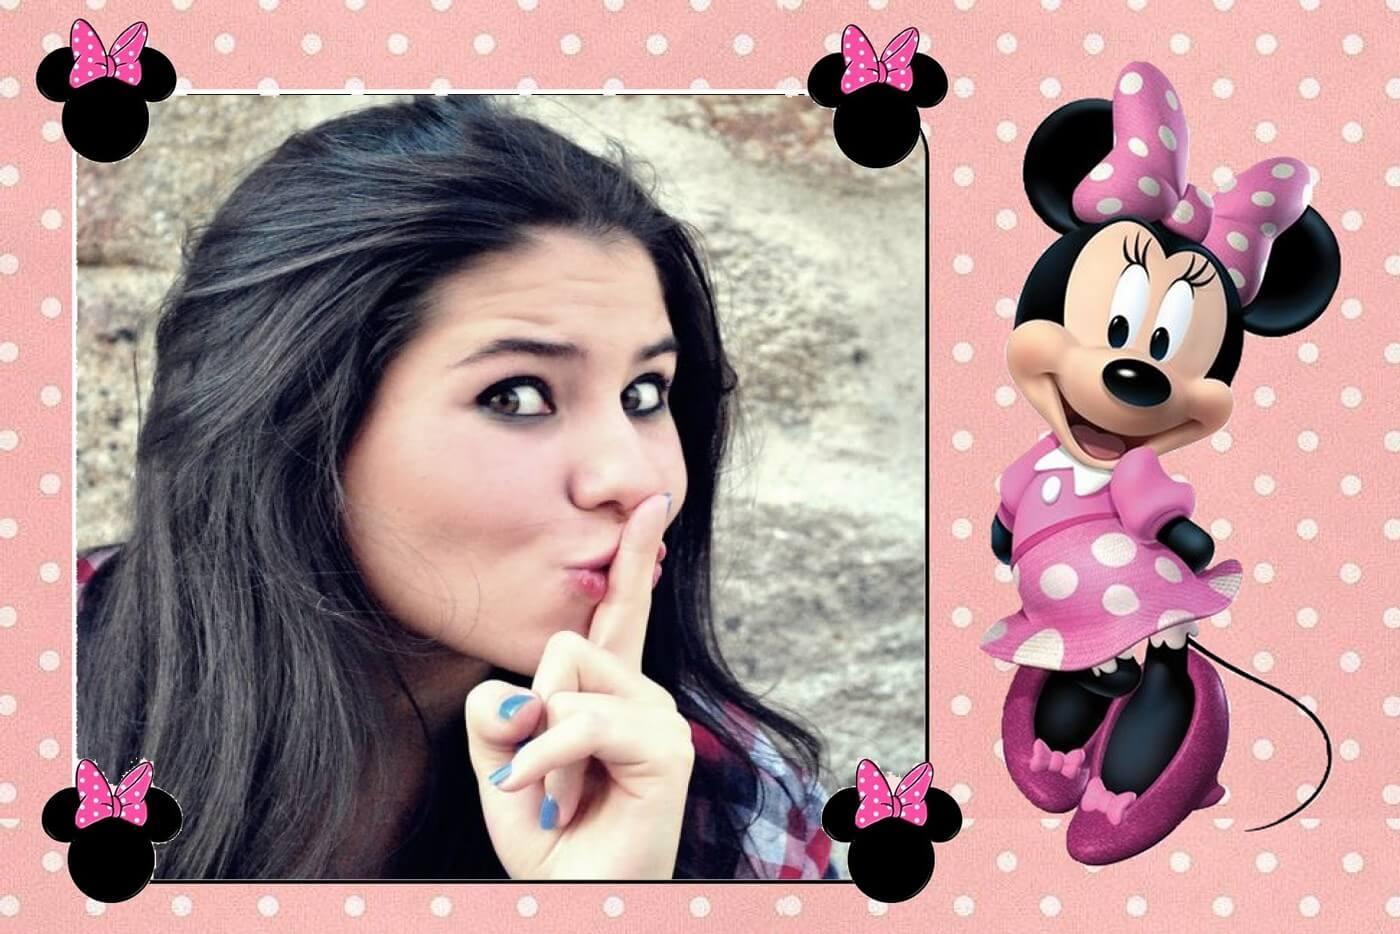 moldura-para-fotos-convite-minnie-rosa-png